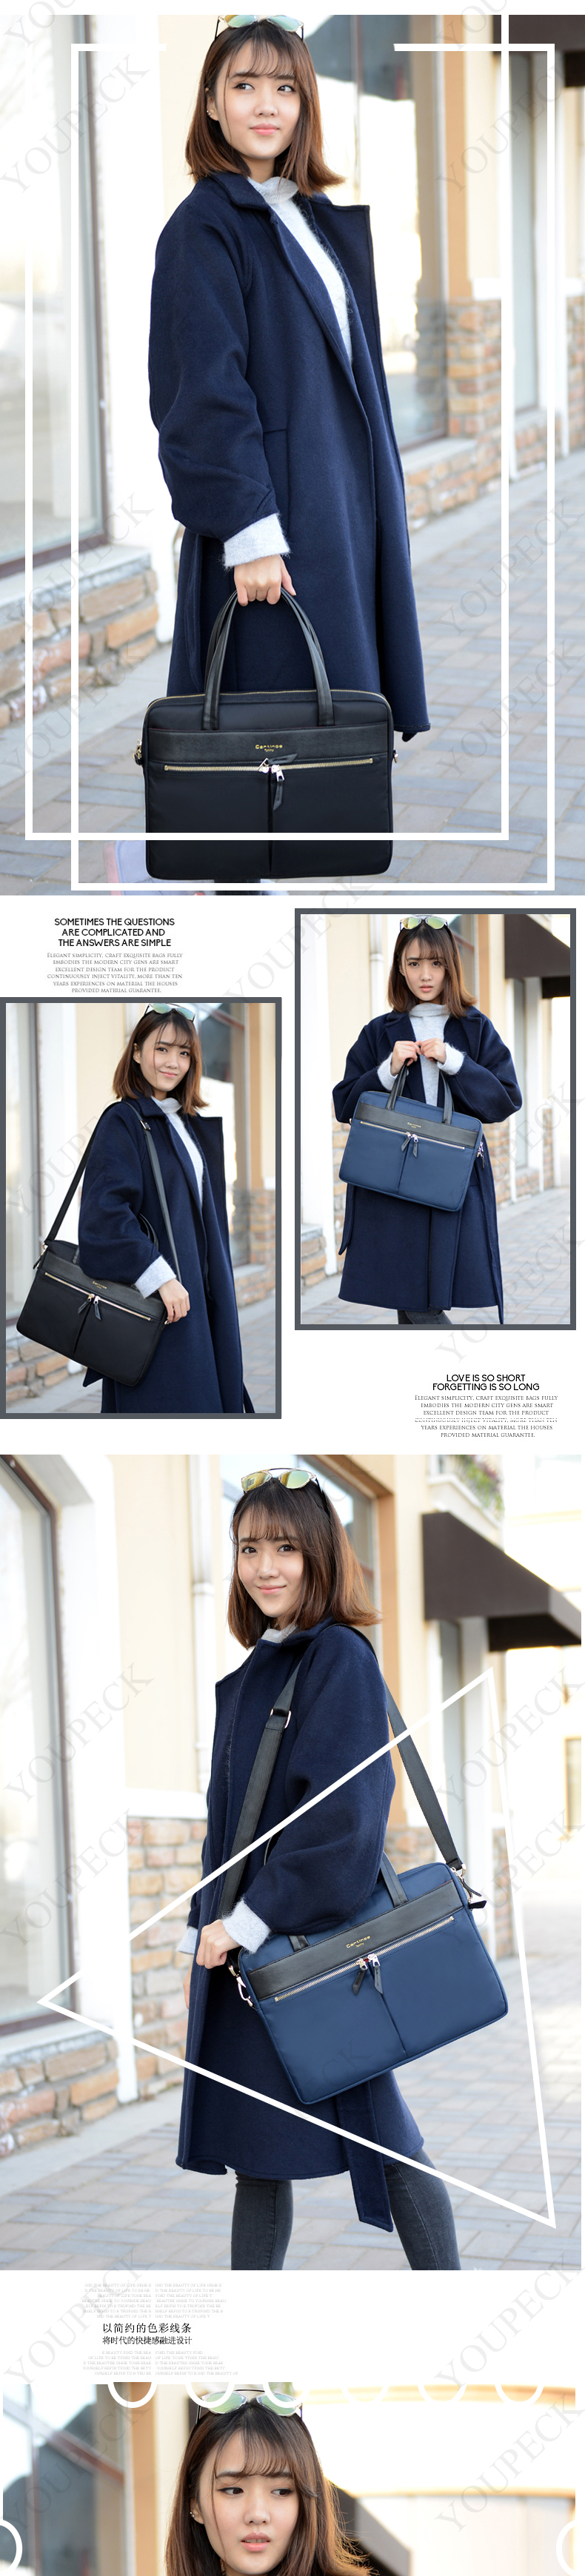 London-shoulder-bags-series_09